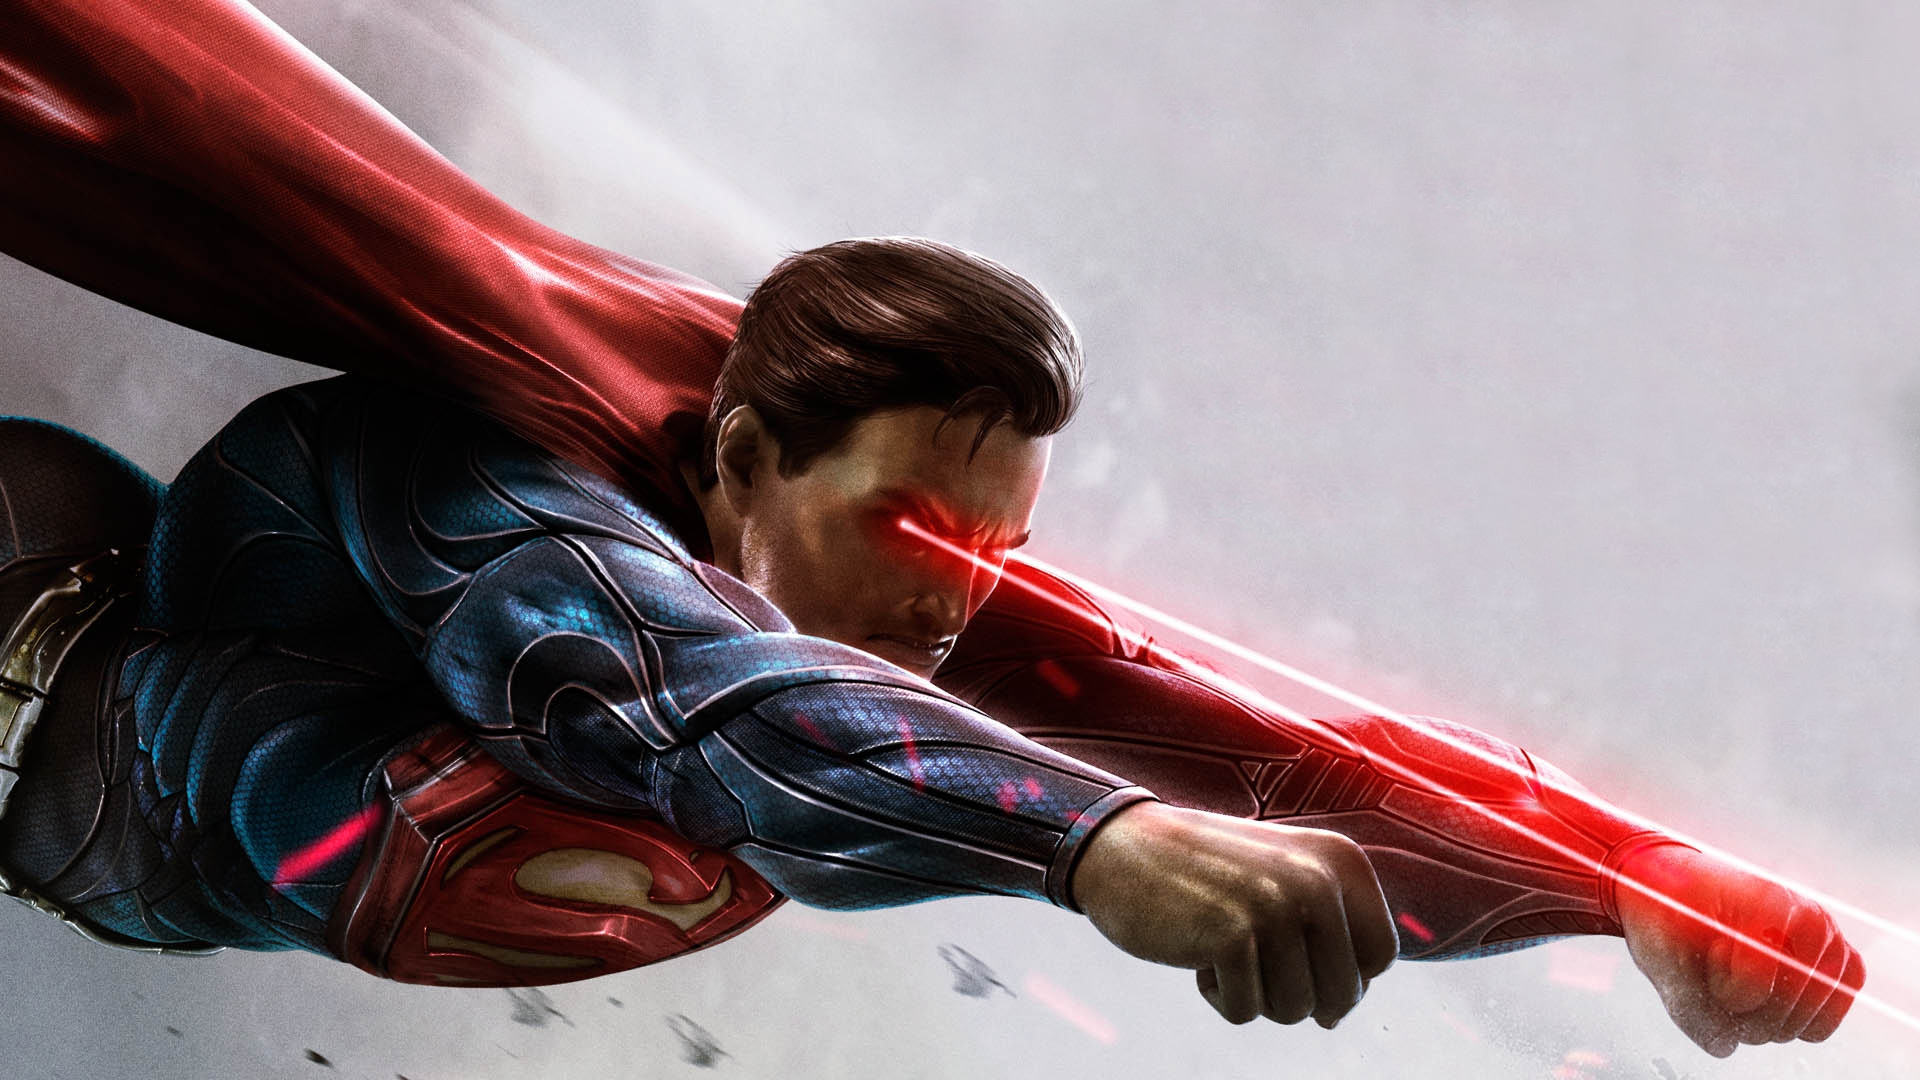 Superman HD Wallpaper For Desktop 3